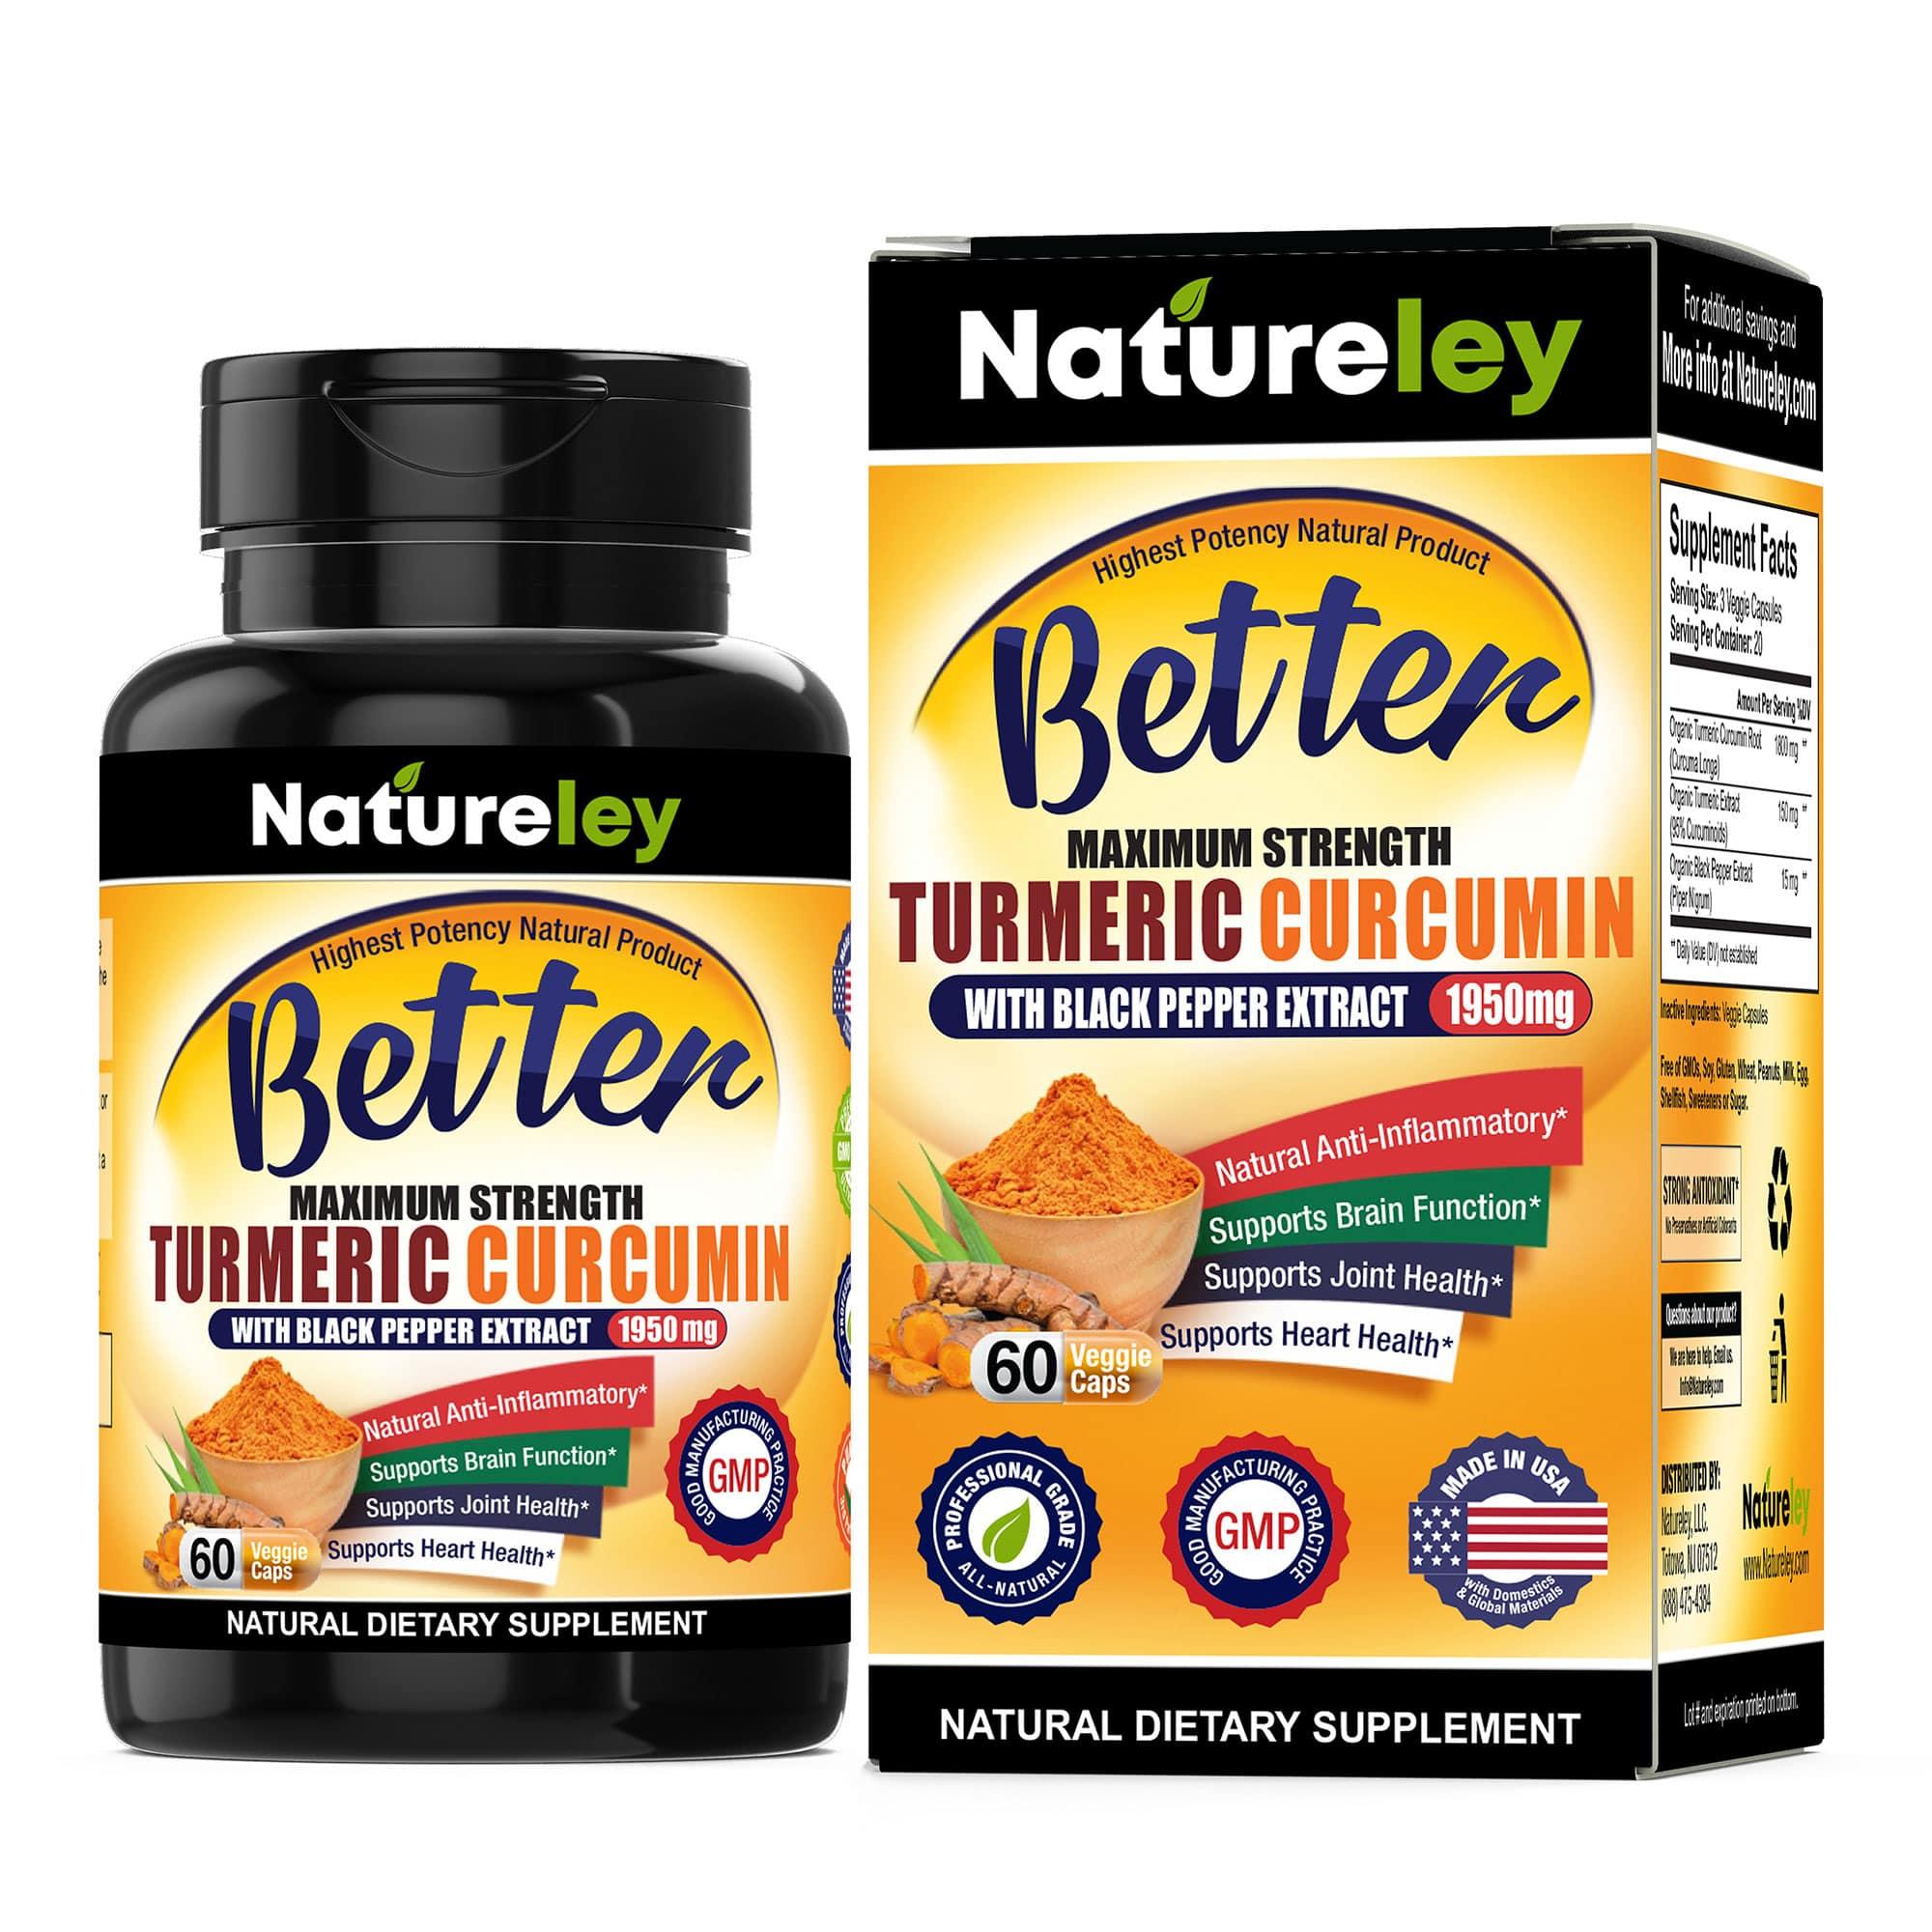 Organic Turmeric Curcumin with Black Pepper Extract - 1950 mg 60 Caps